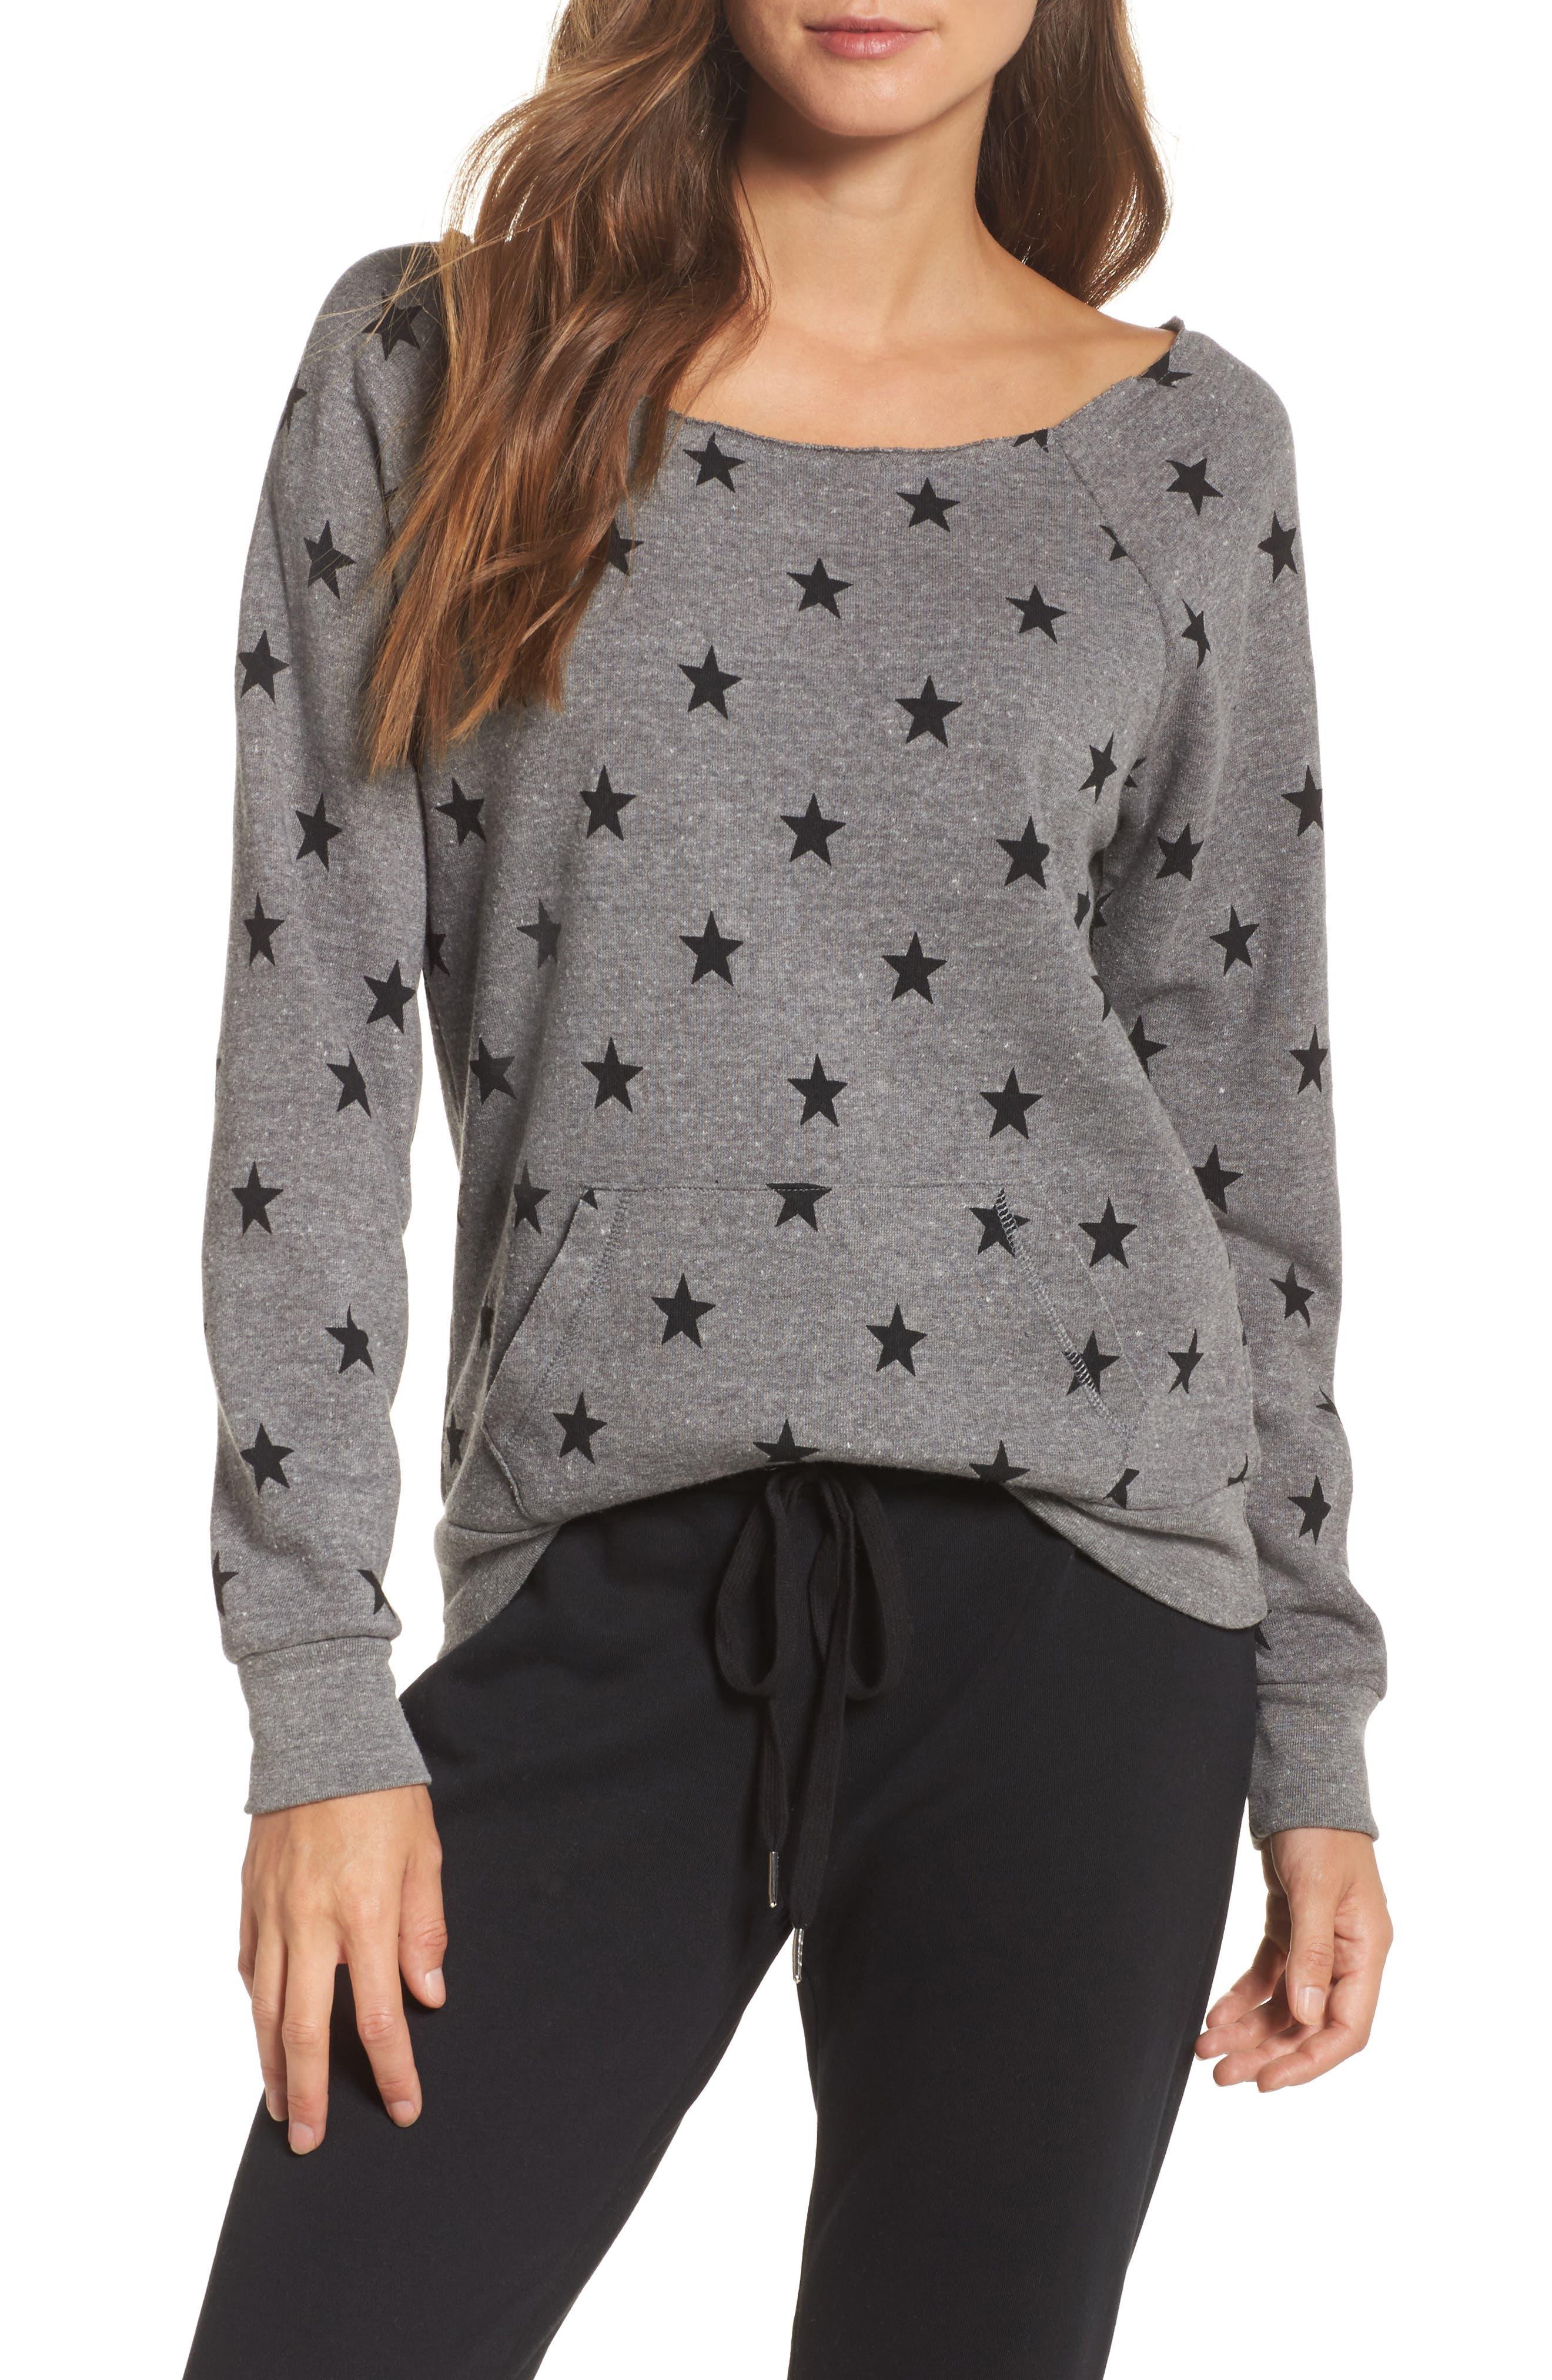 Maniac Camo Fleece Sweatshirt,                             Main thumbnail 1, color,                             Eco Grey Stars